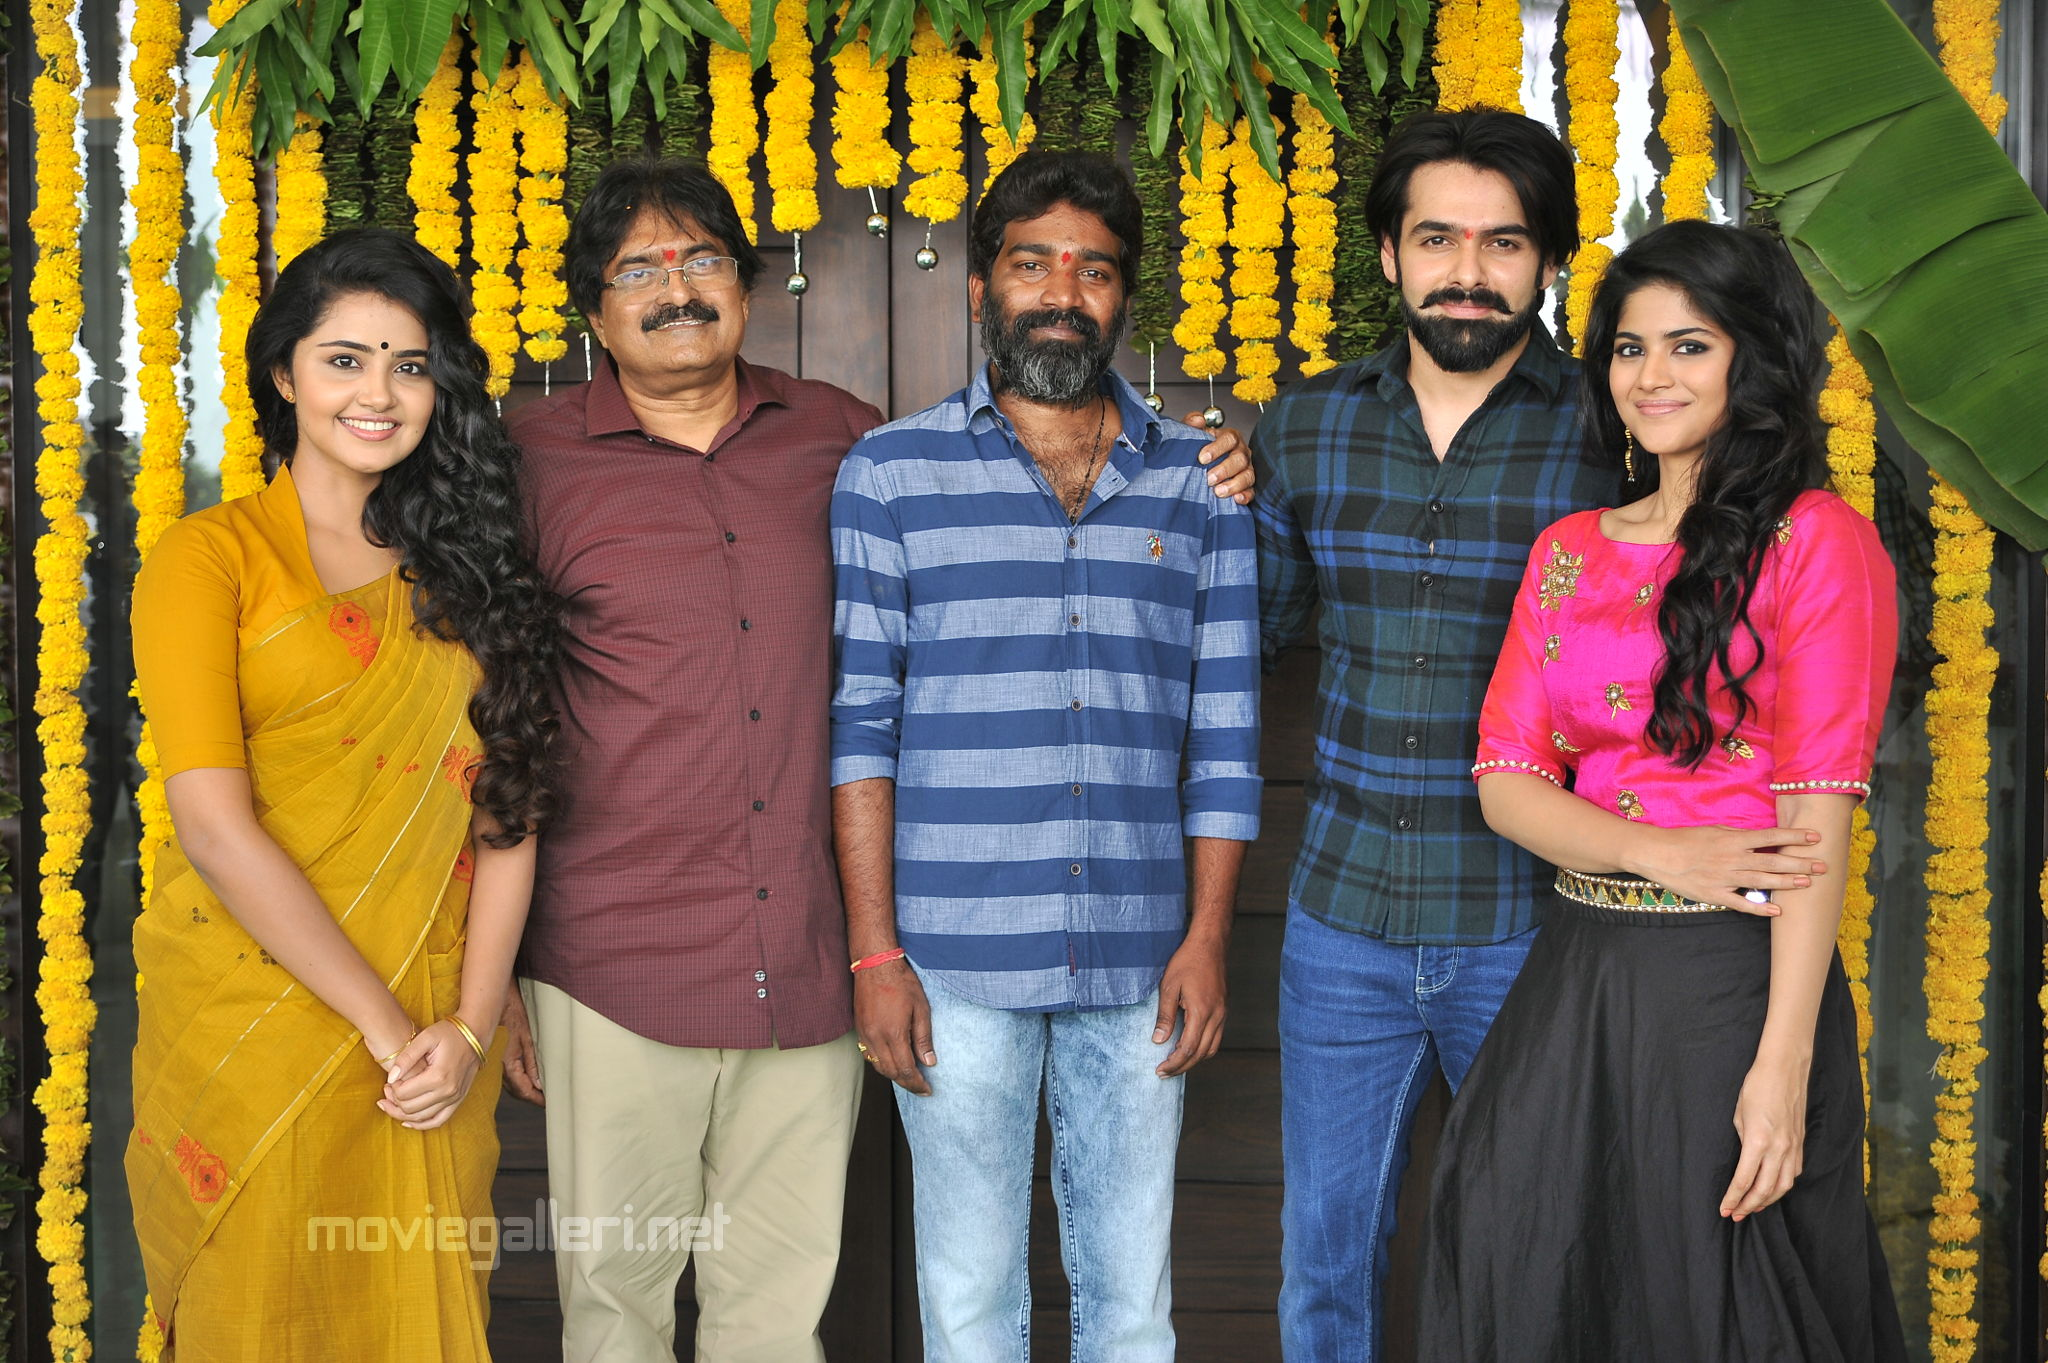 Anupama Parameswaran, Ram Pothineni, Sravanthi Ravi Kishore, Kishore Thummala, Megha Akash @ Vunnadi Okkate Zindagi Movie Launch